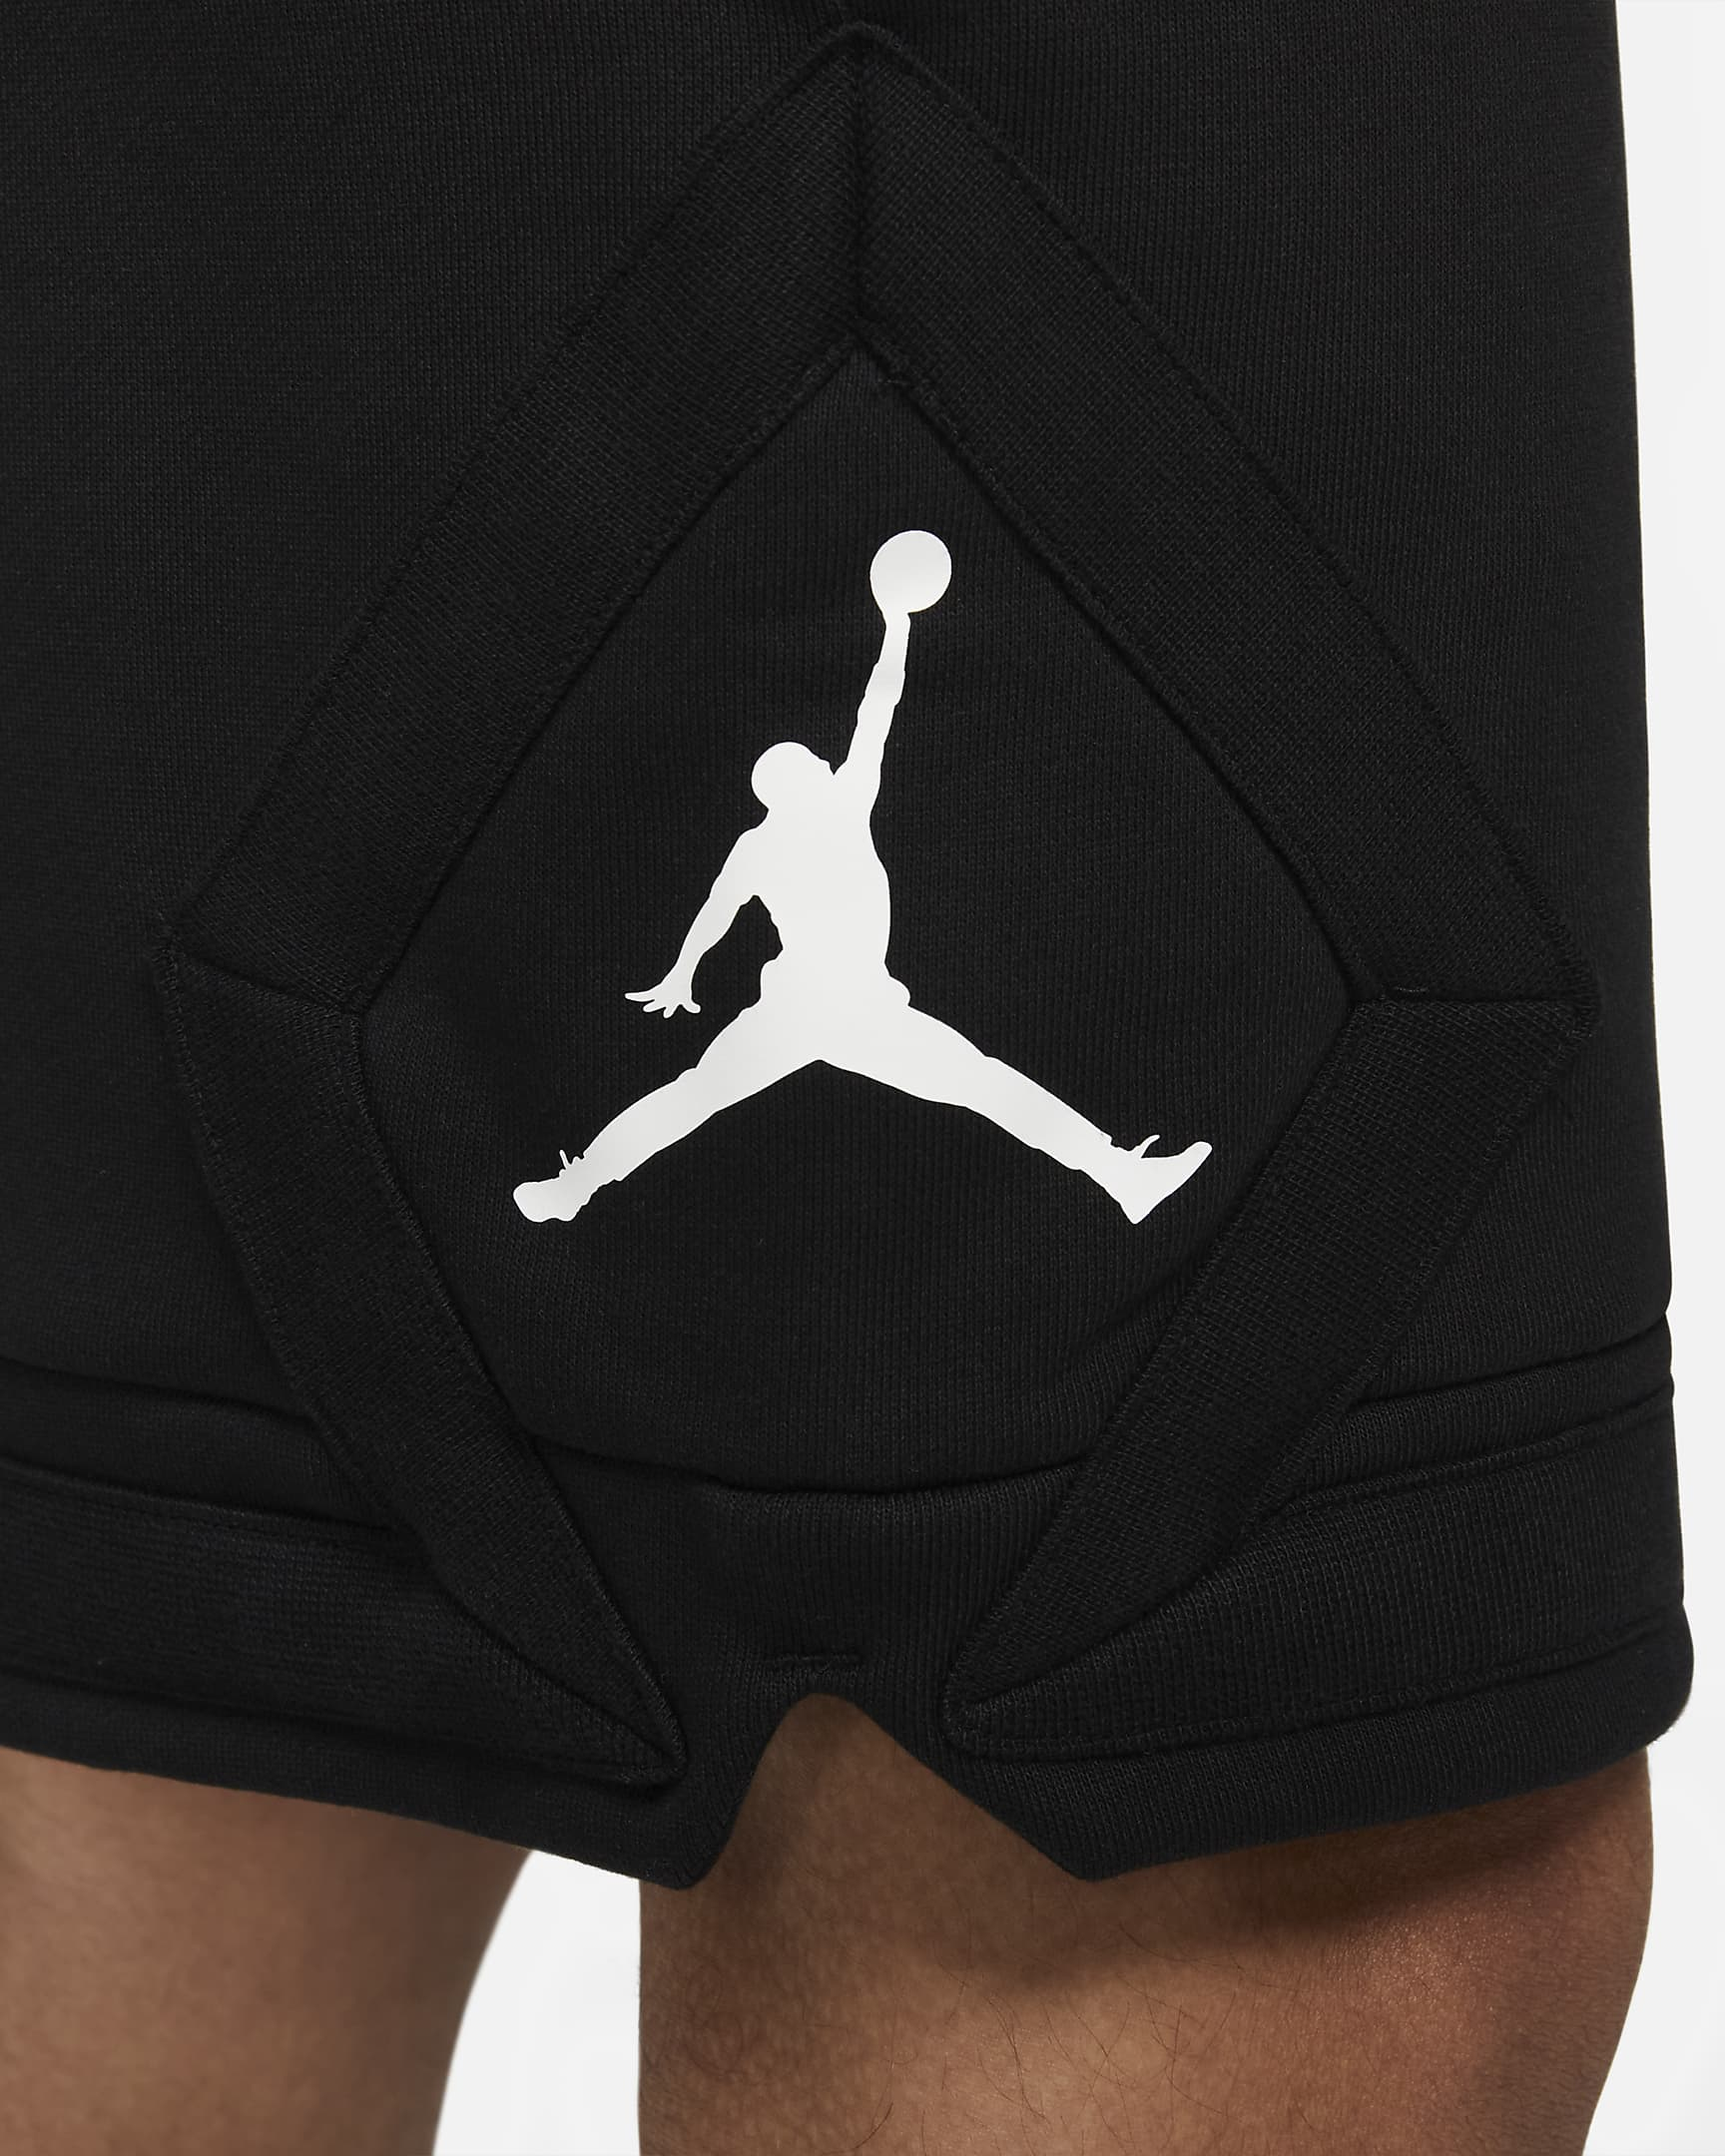 jordan-essential-mens-fleece-diamond-shorts-hcJWW8-1.png